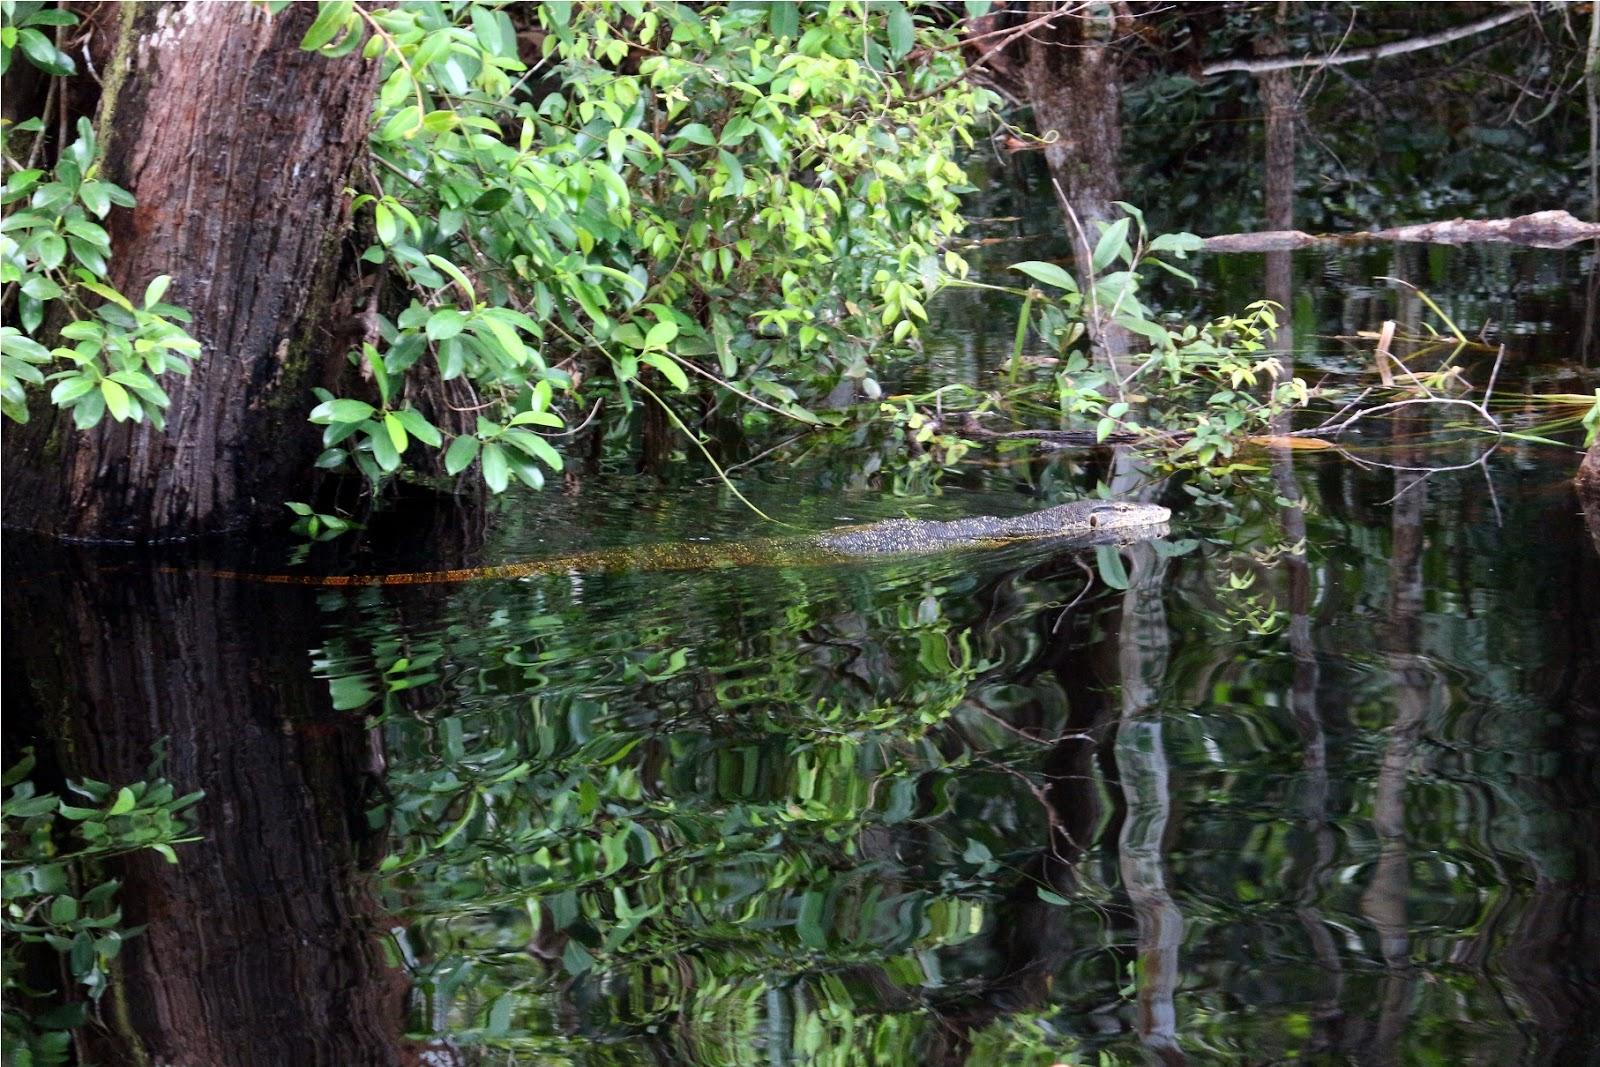 Seekor biawak mengendap-endap mengincar ikan-ikan di antara bakau